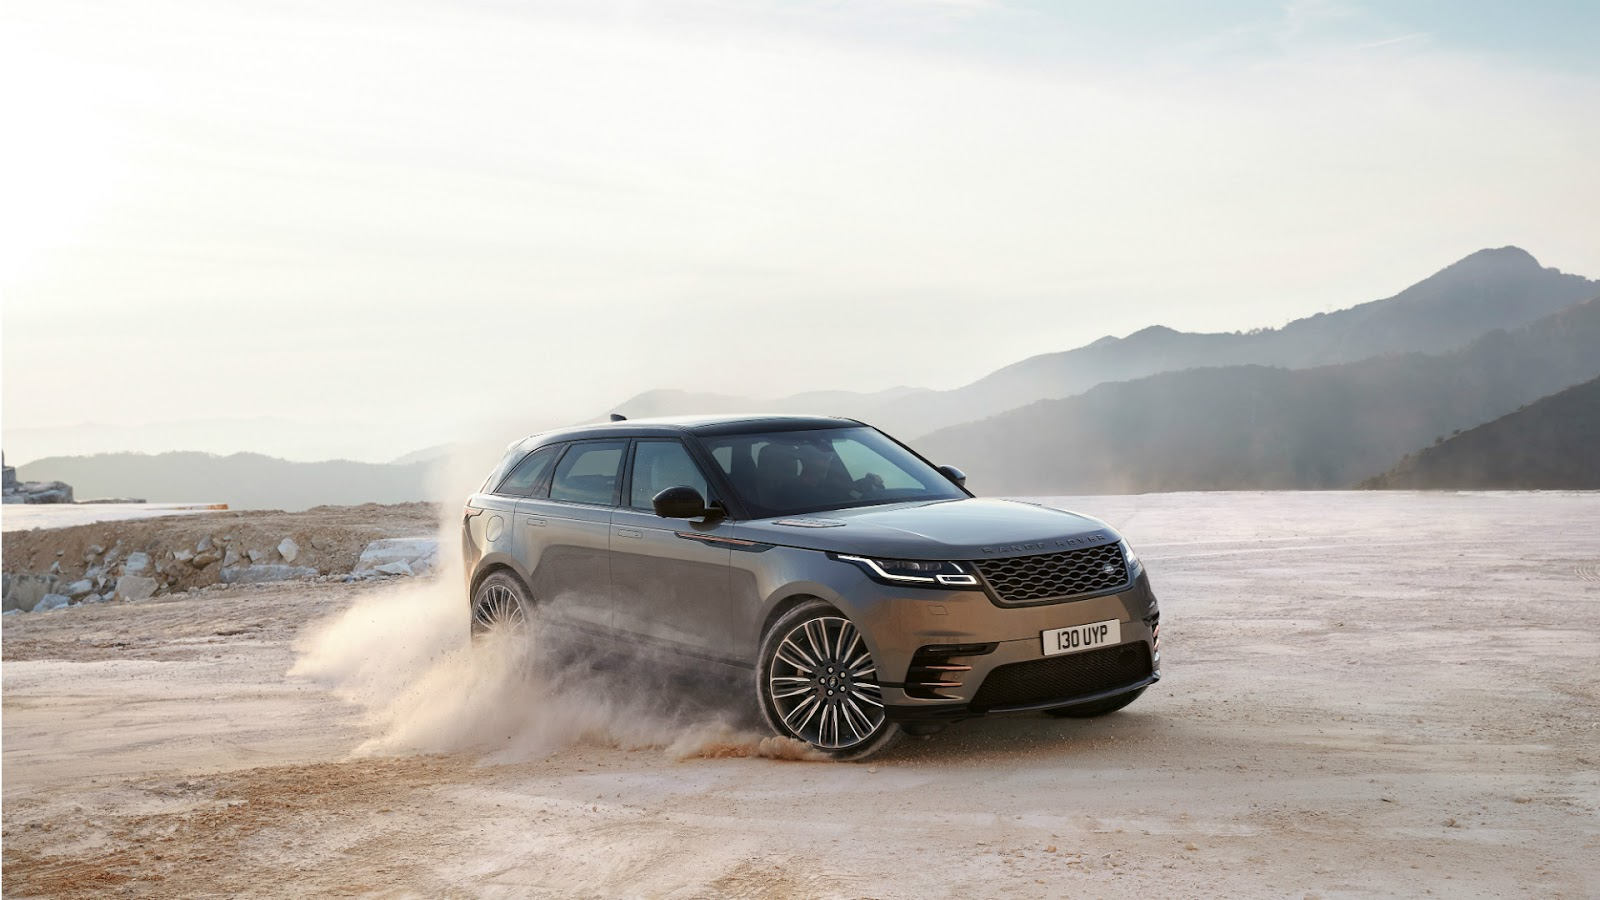 Range Rover Velar HD image